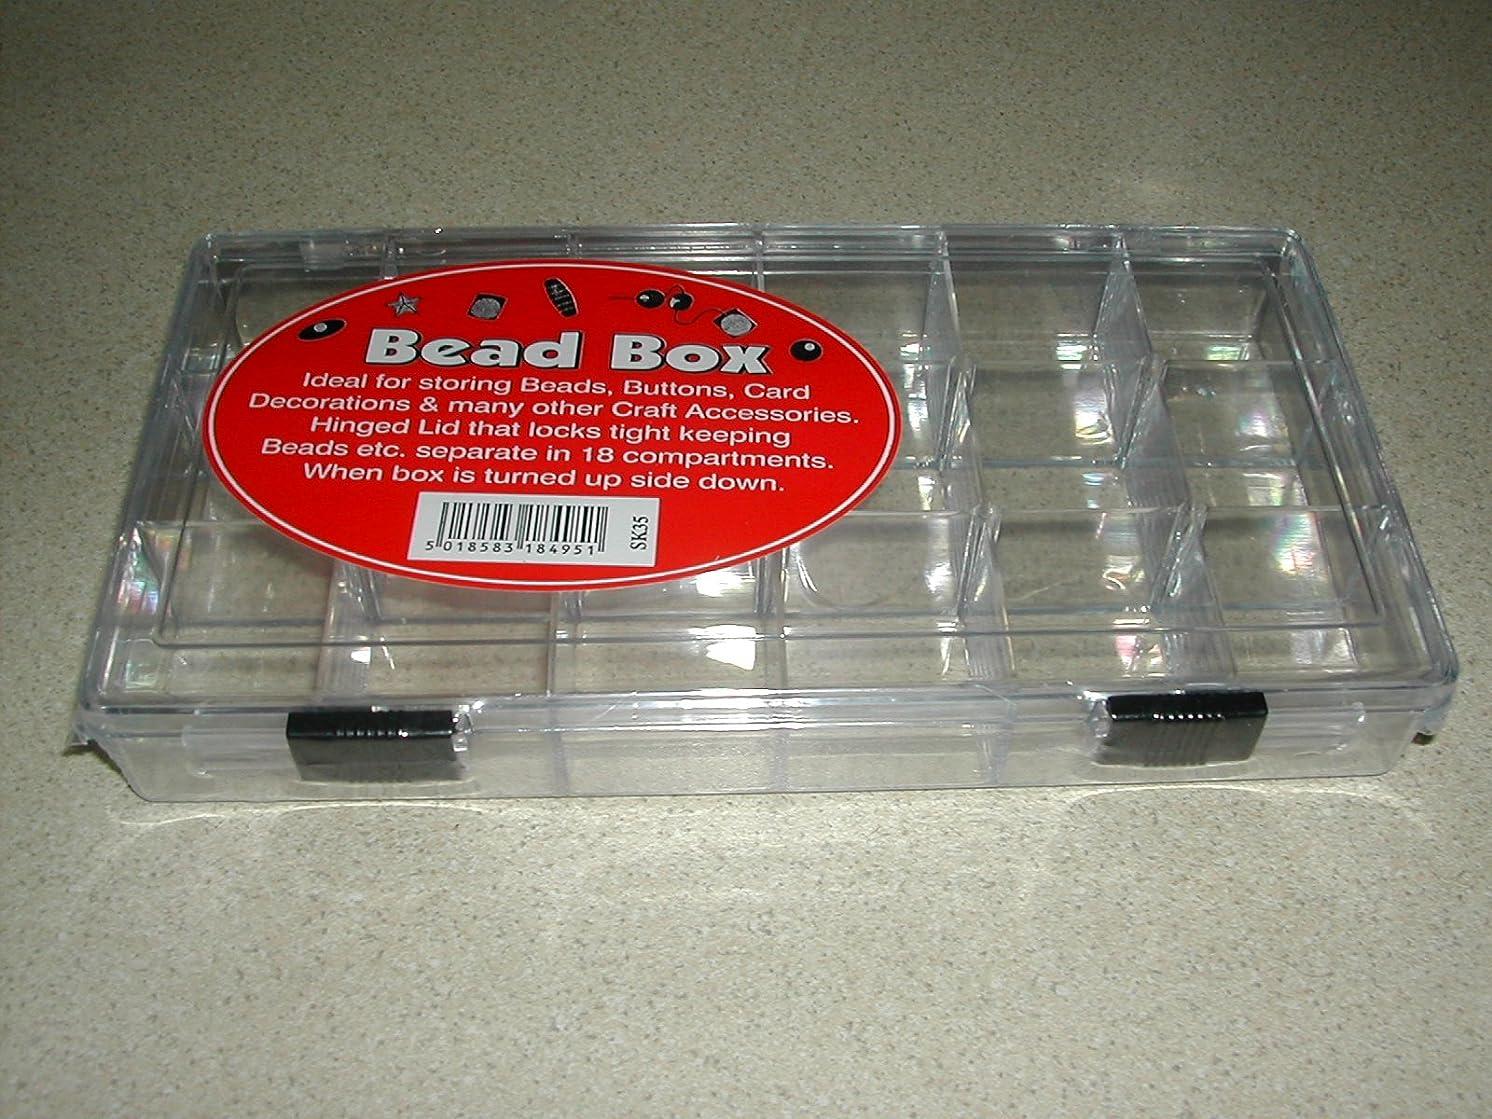 Sehlbach Bead Small Item Storage Box